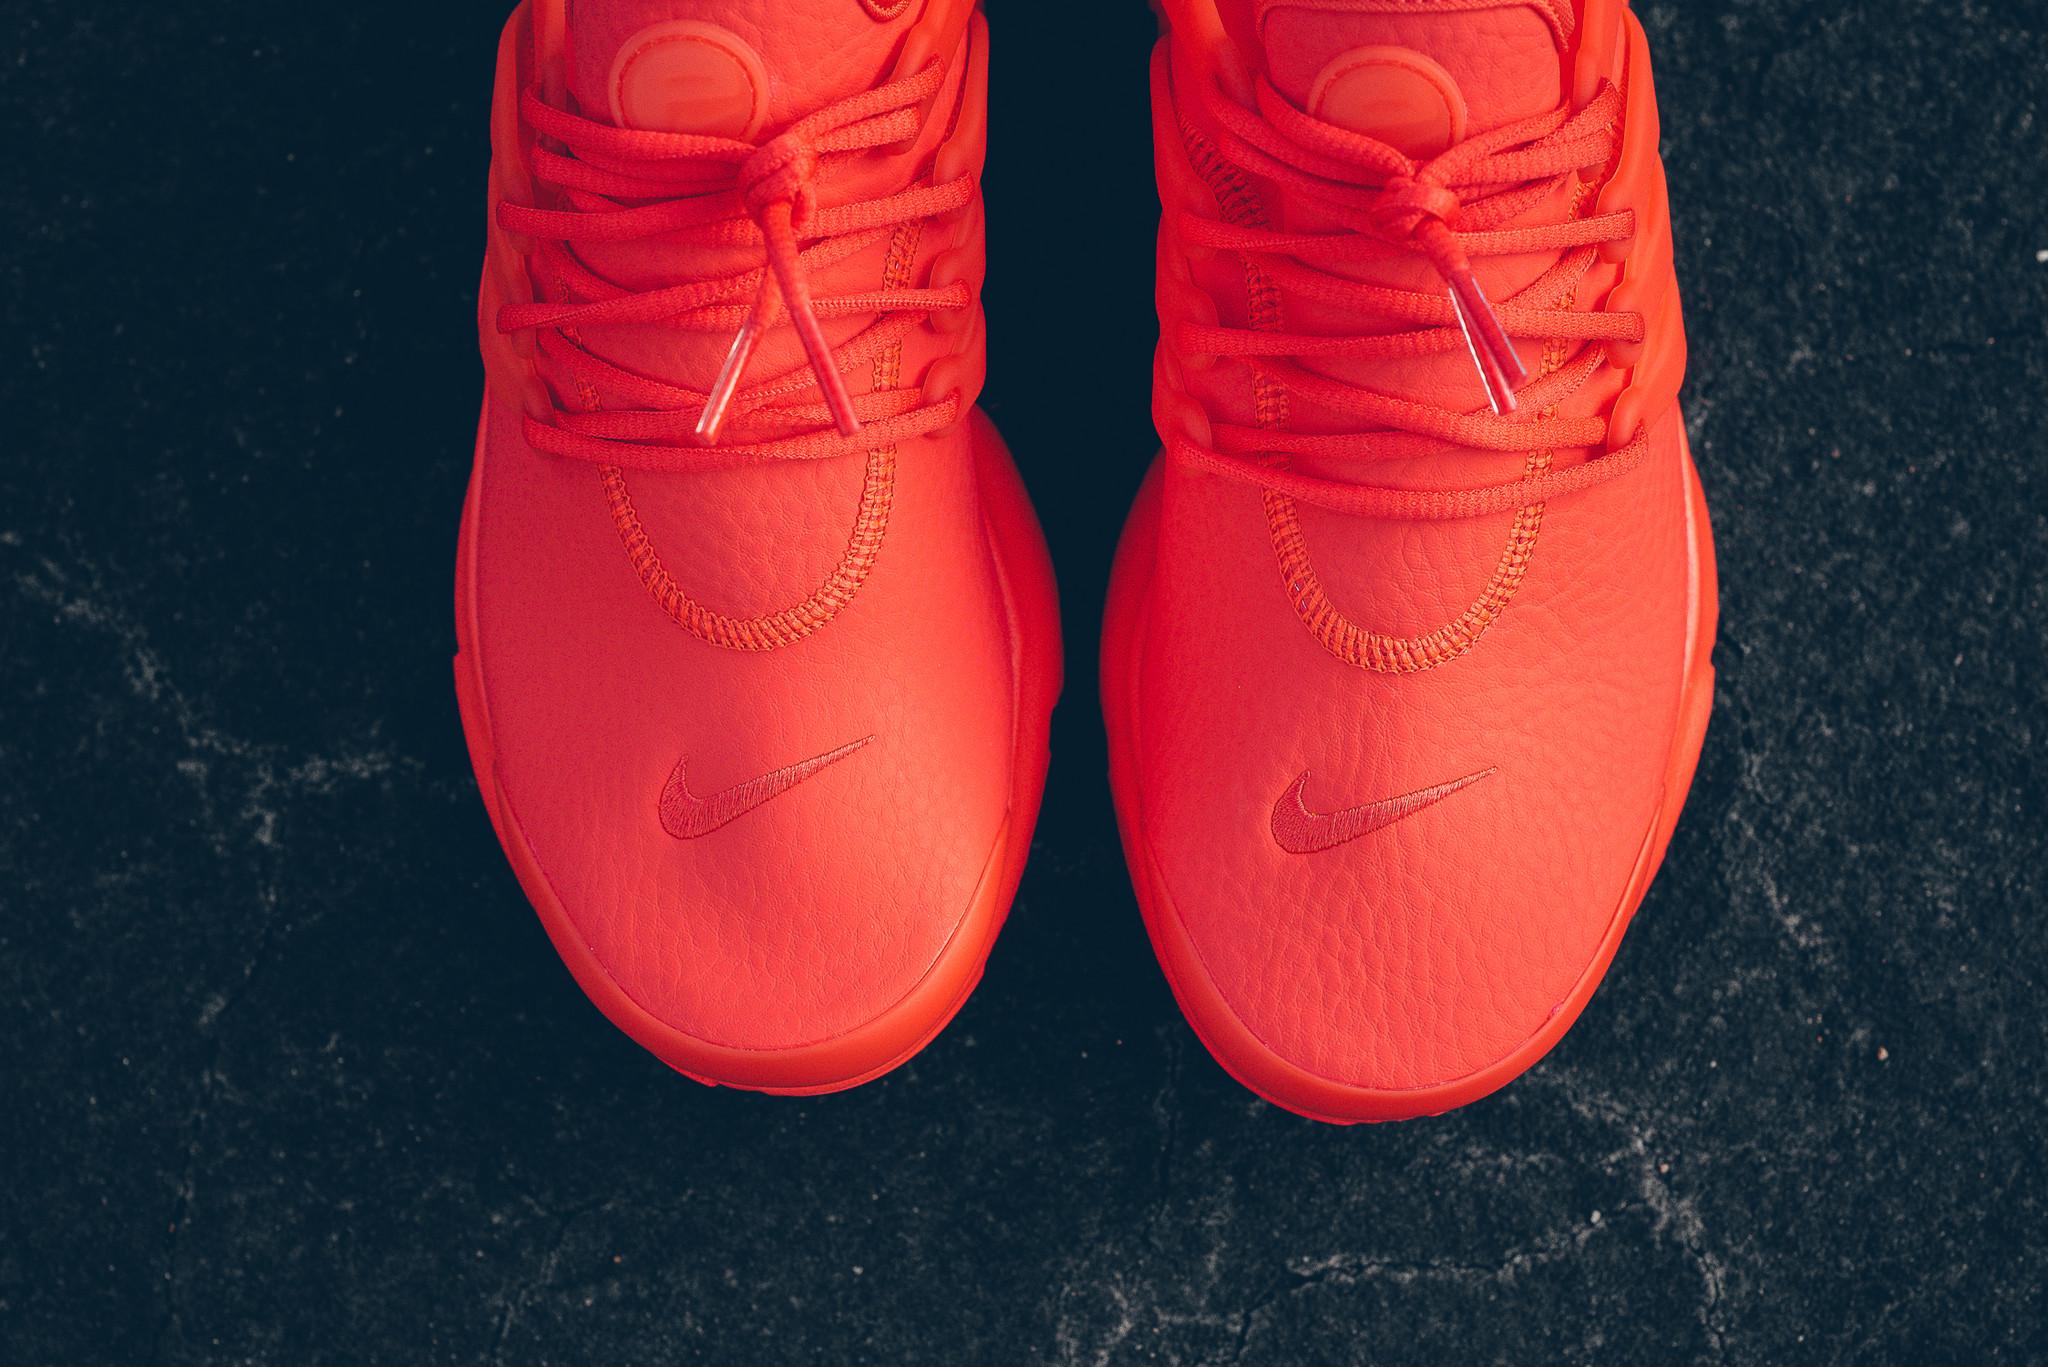 WMNS_Nike_Air_Presto_PRM_Max_Orange_Sneaker_Politics_HypeBeast_1